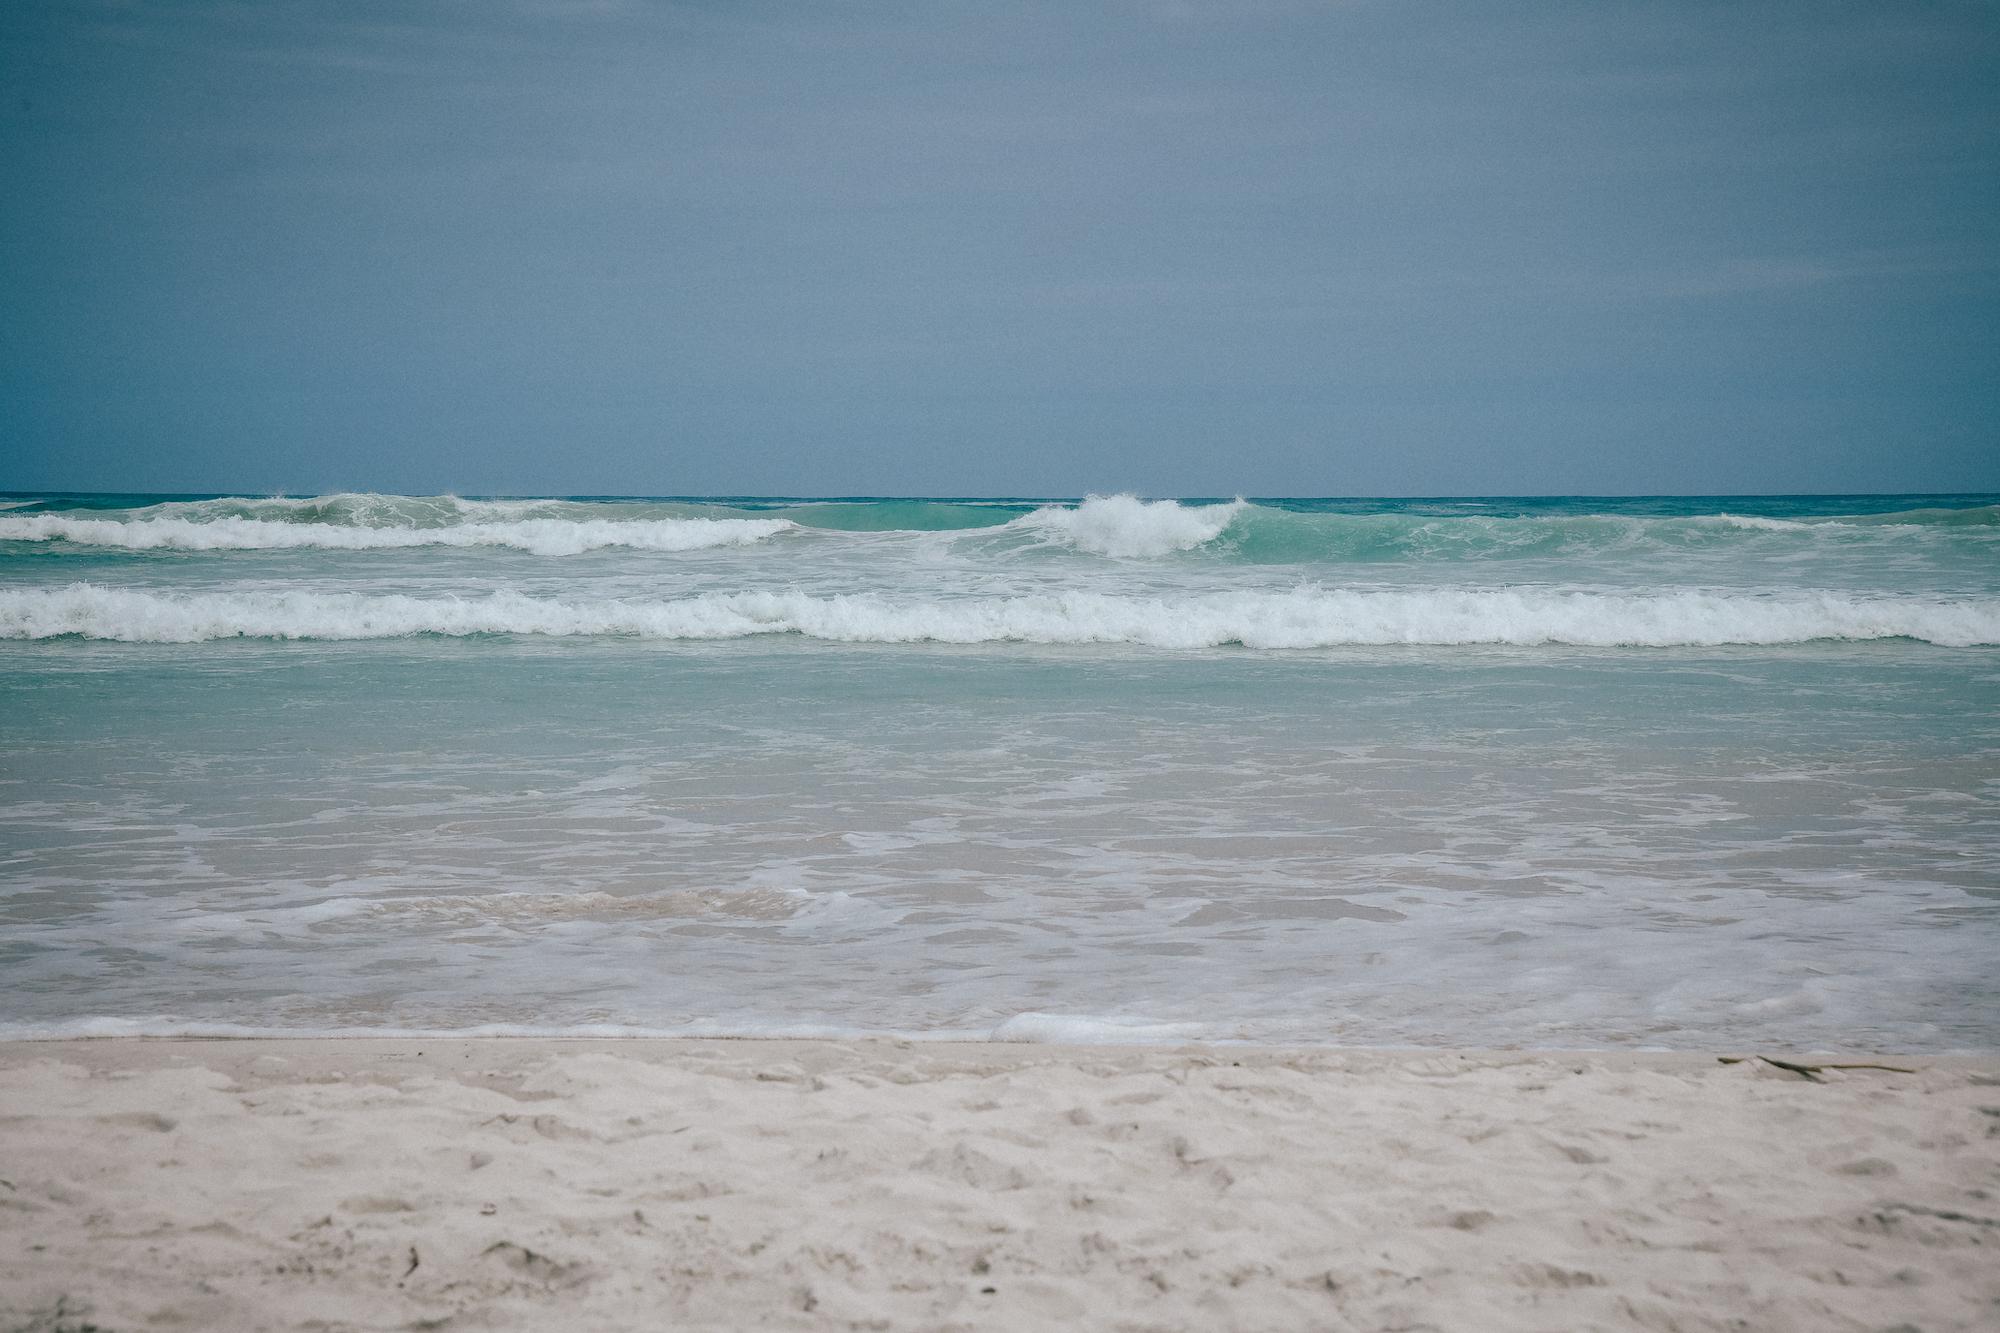 beachside in tortuga bay, galapagos